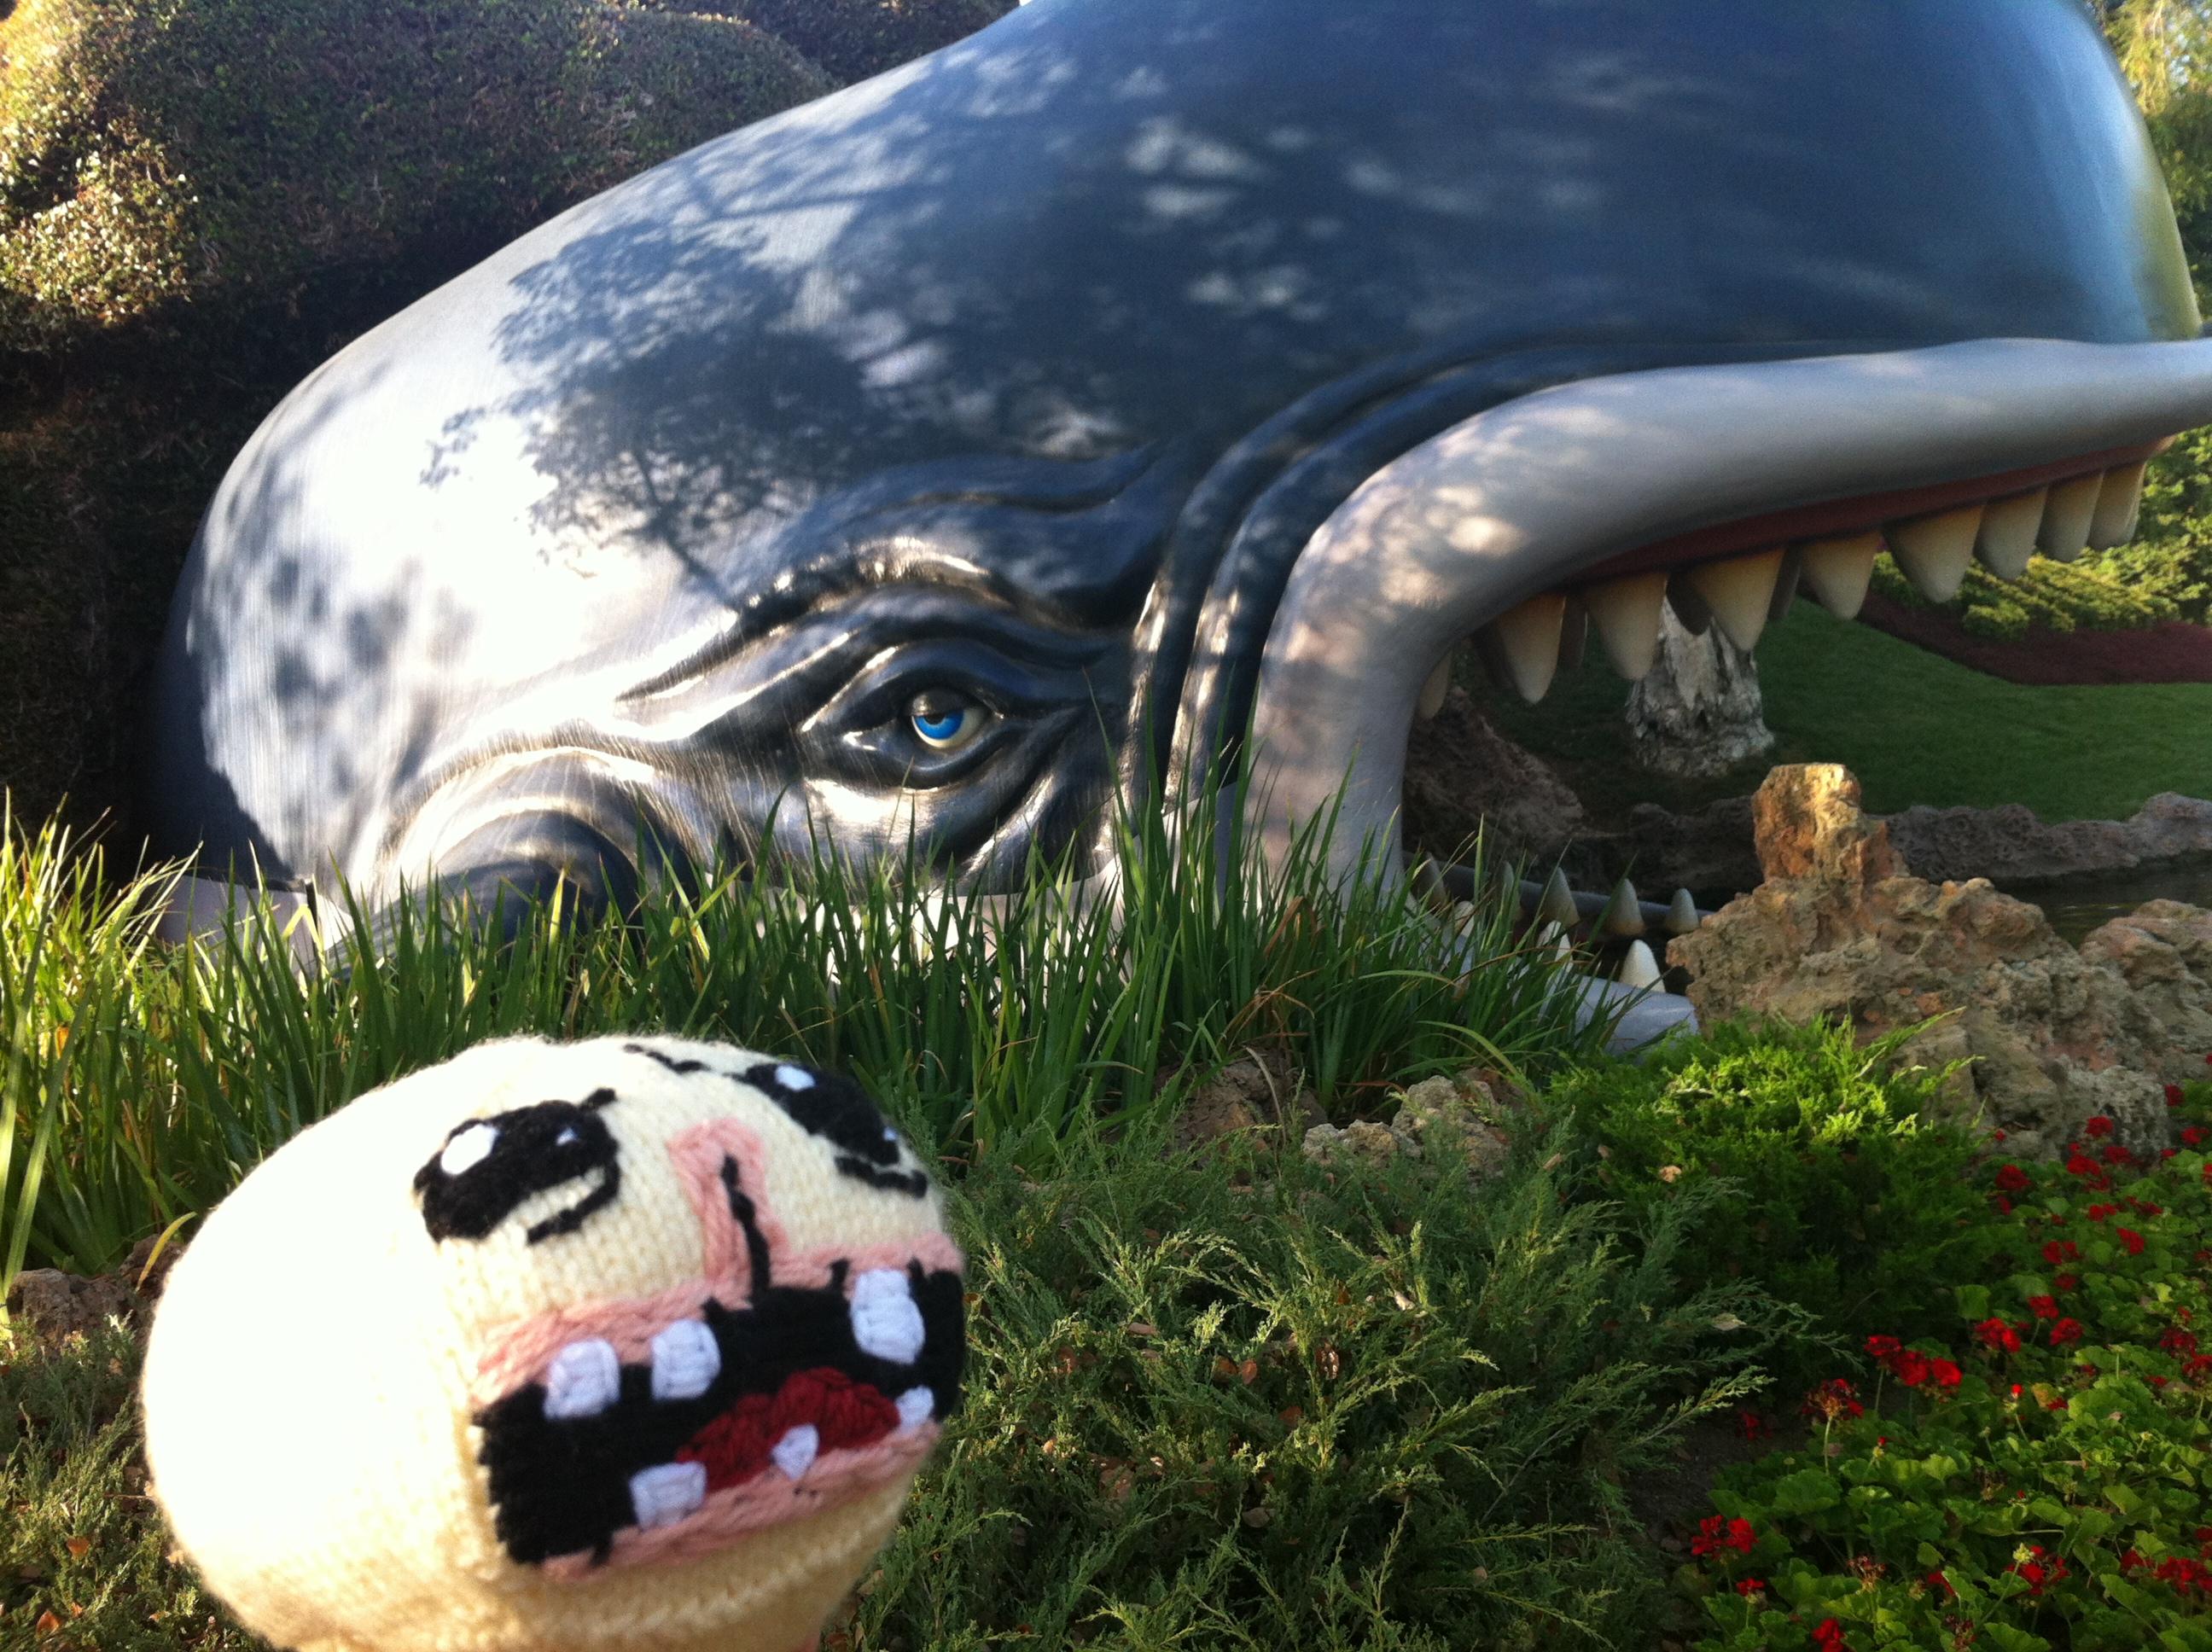 Monstro meets Monstro by LuigiFan00001